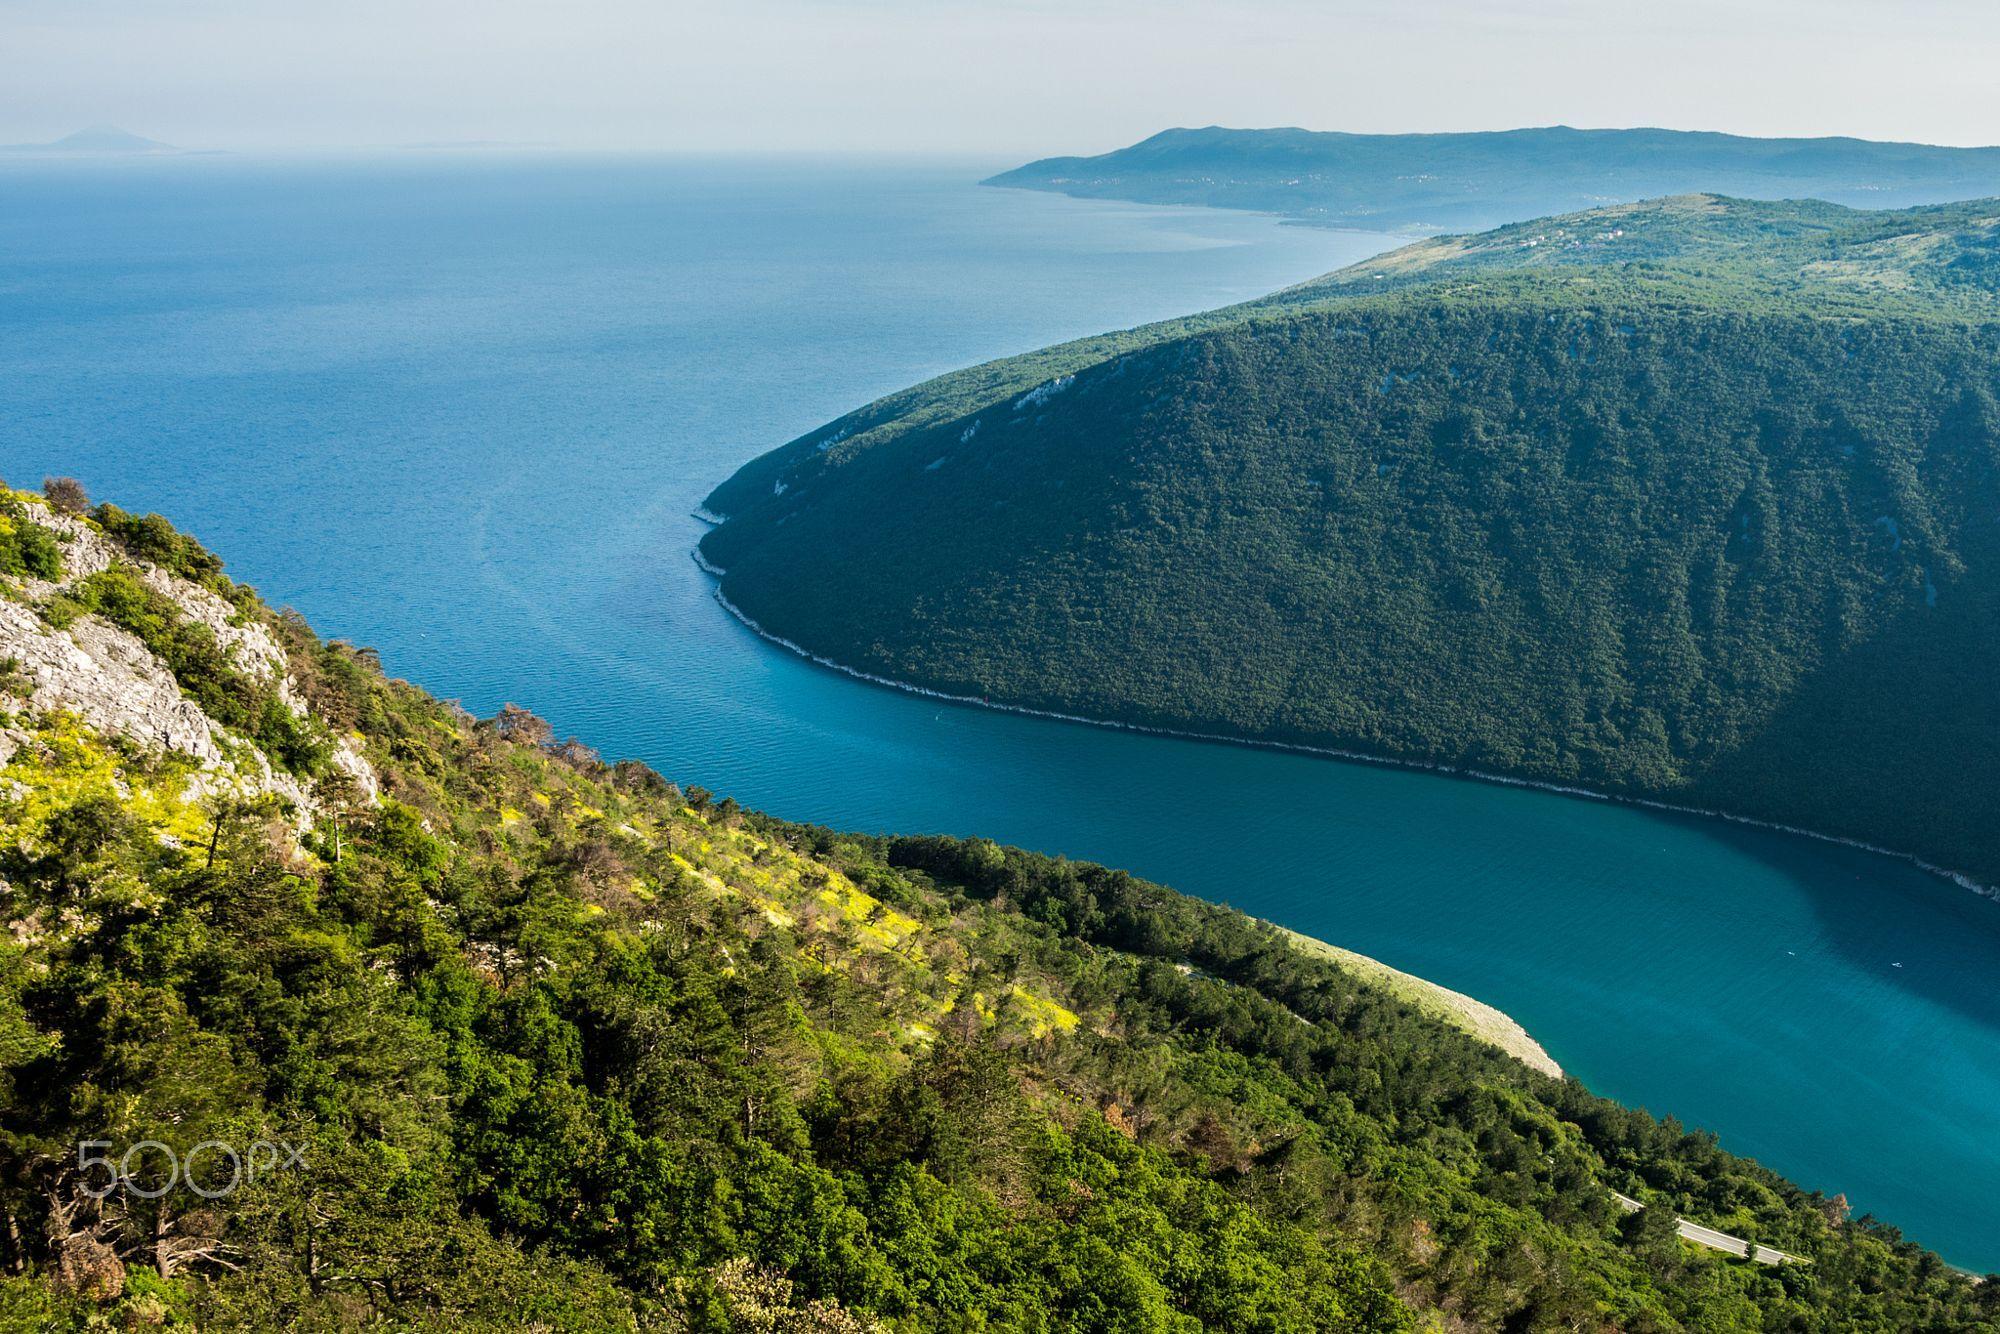 Plomin Bay by Deni Peršić on 500px